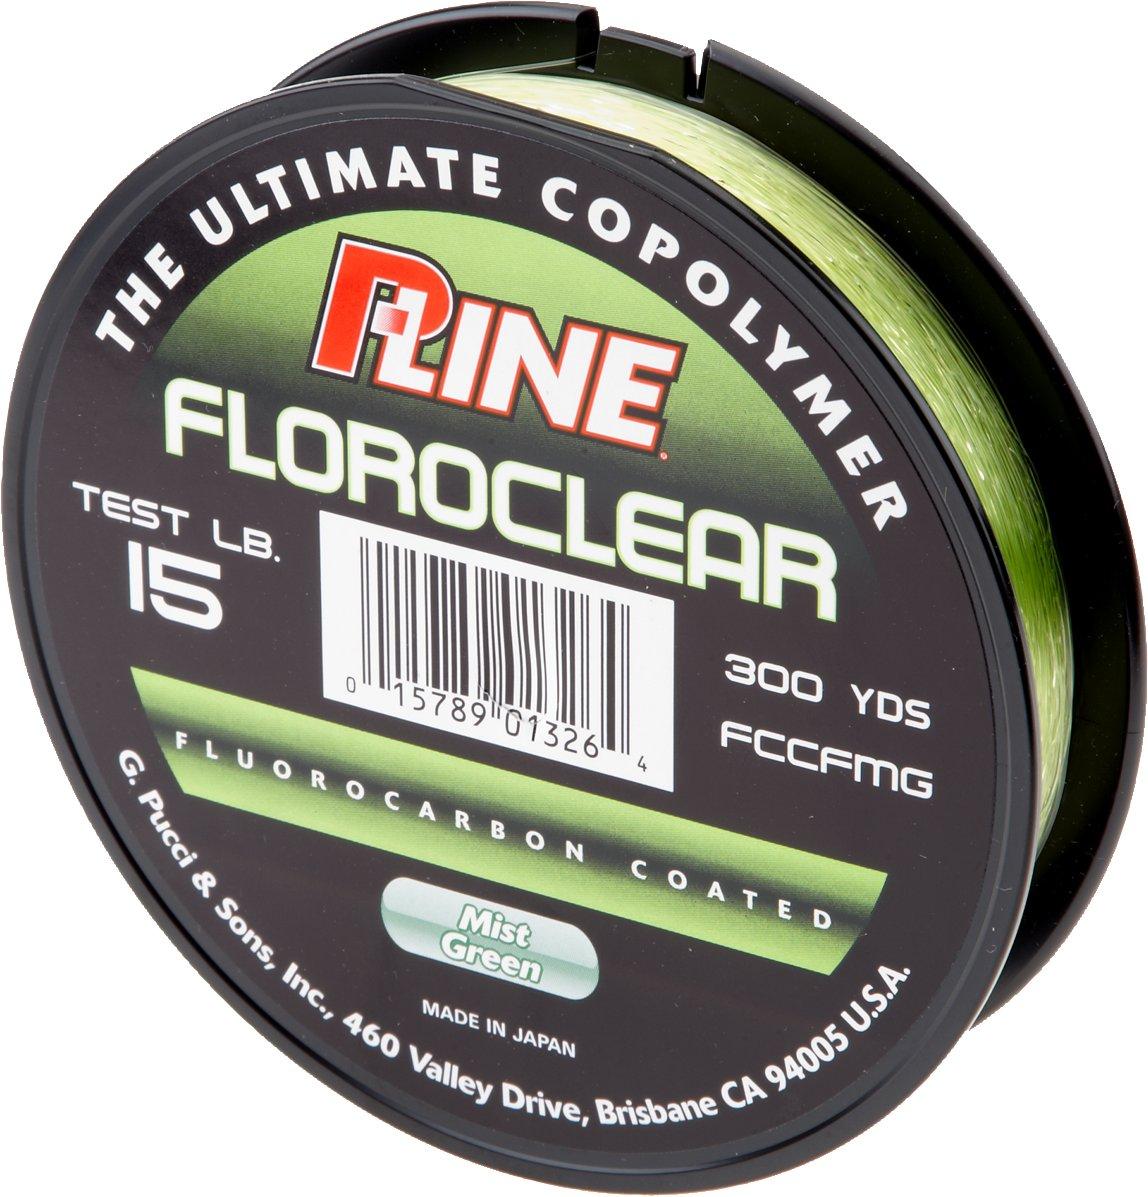 P-Line® Floroclear 15 lb. - 300 yards Fluorocarbon